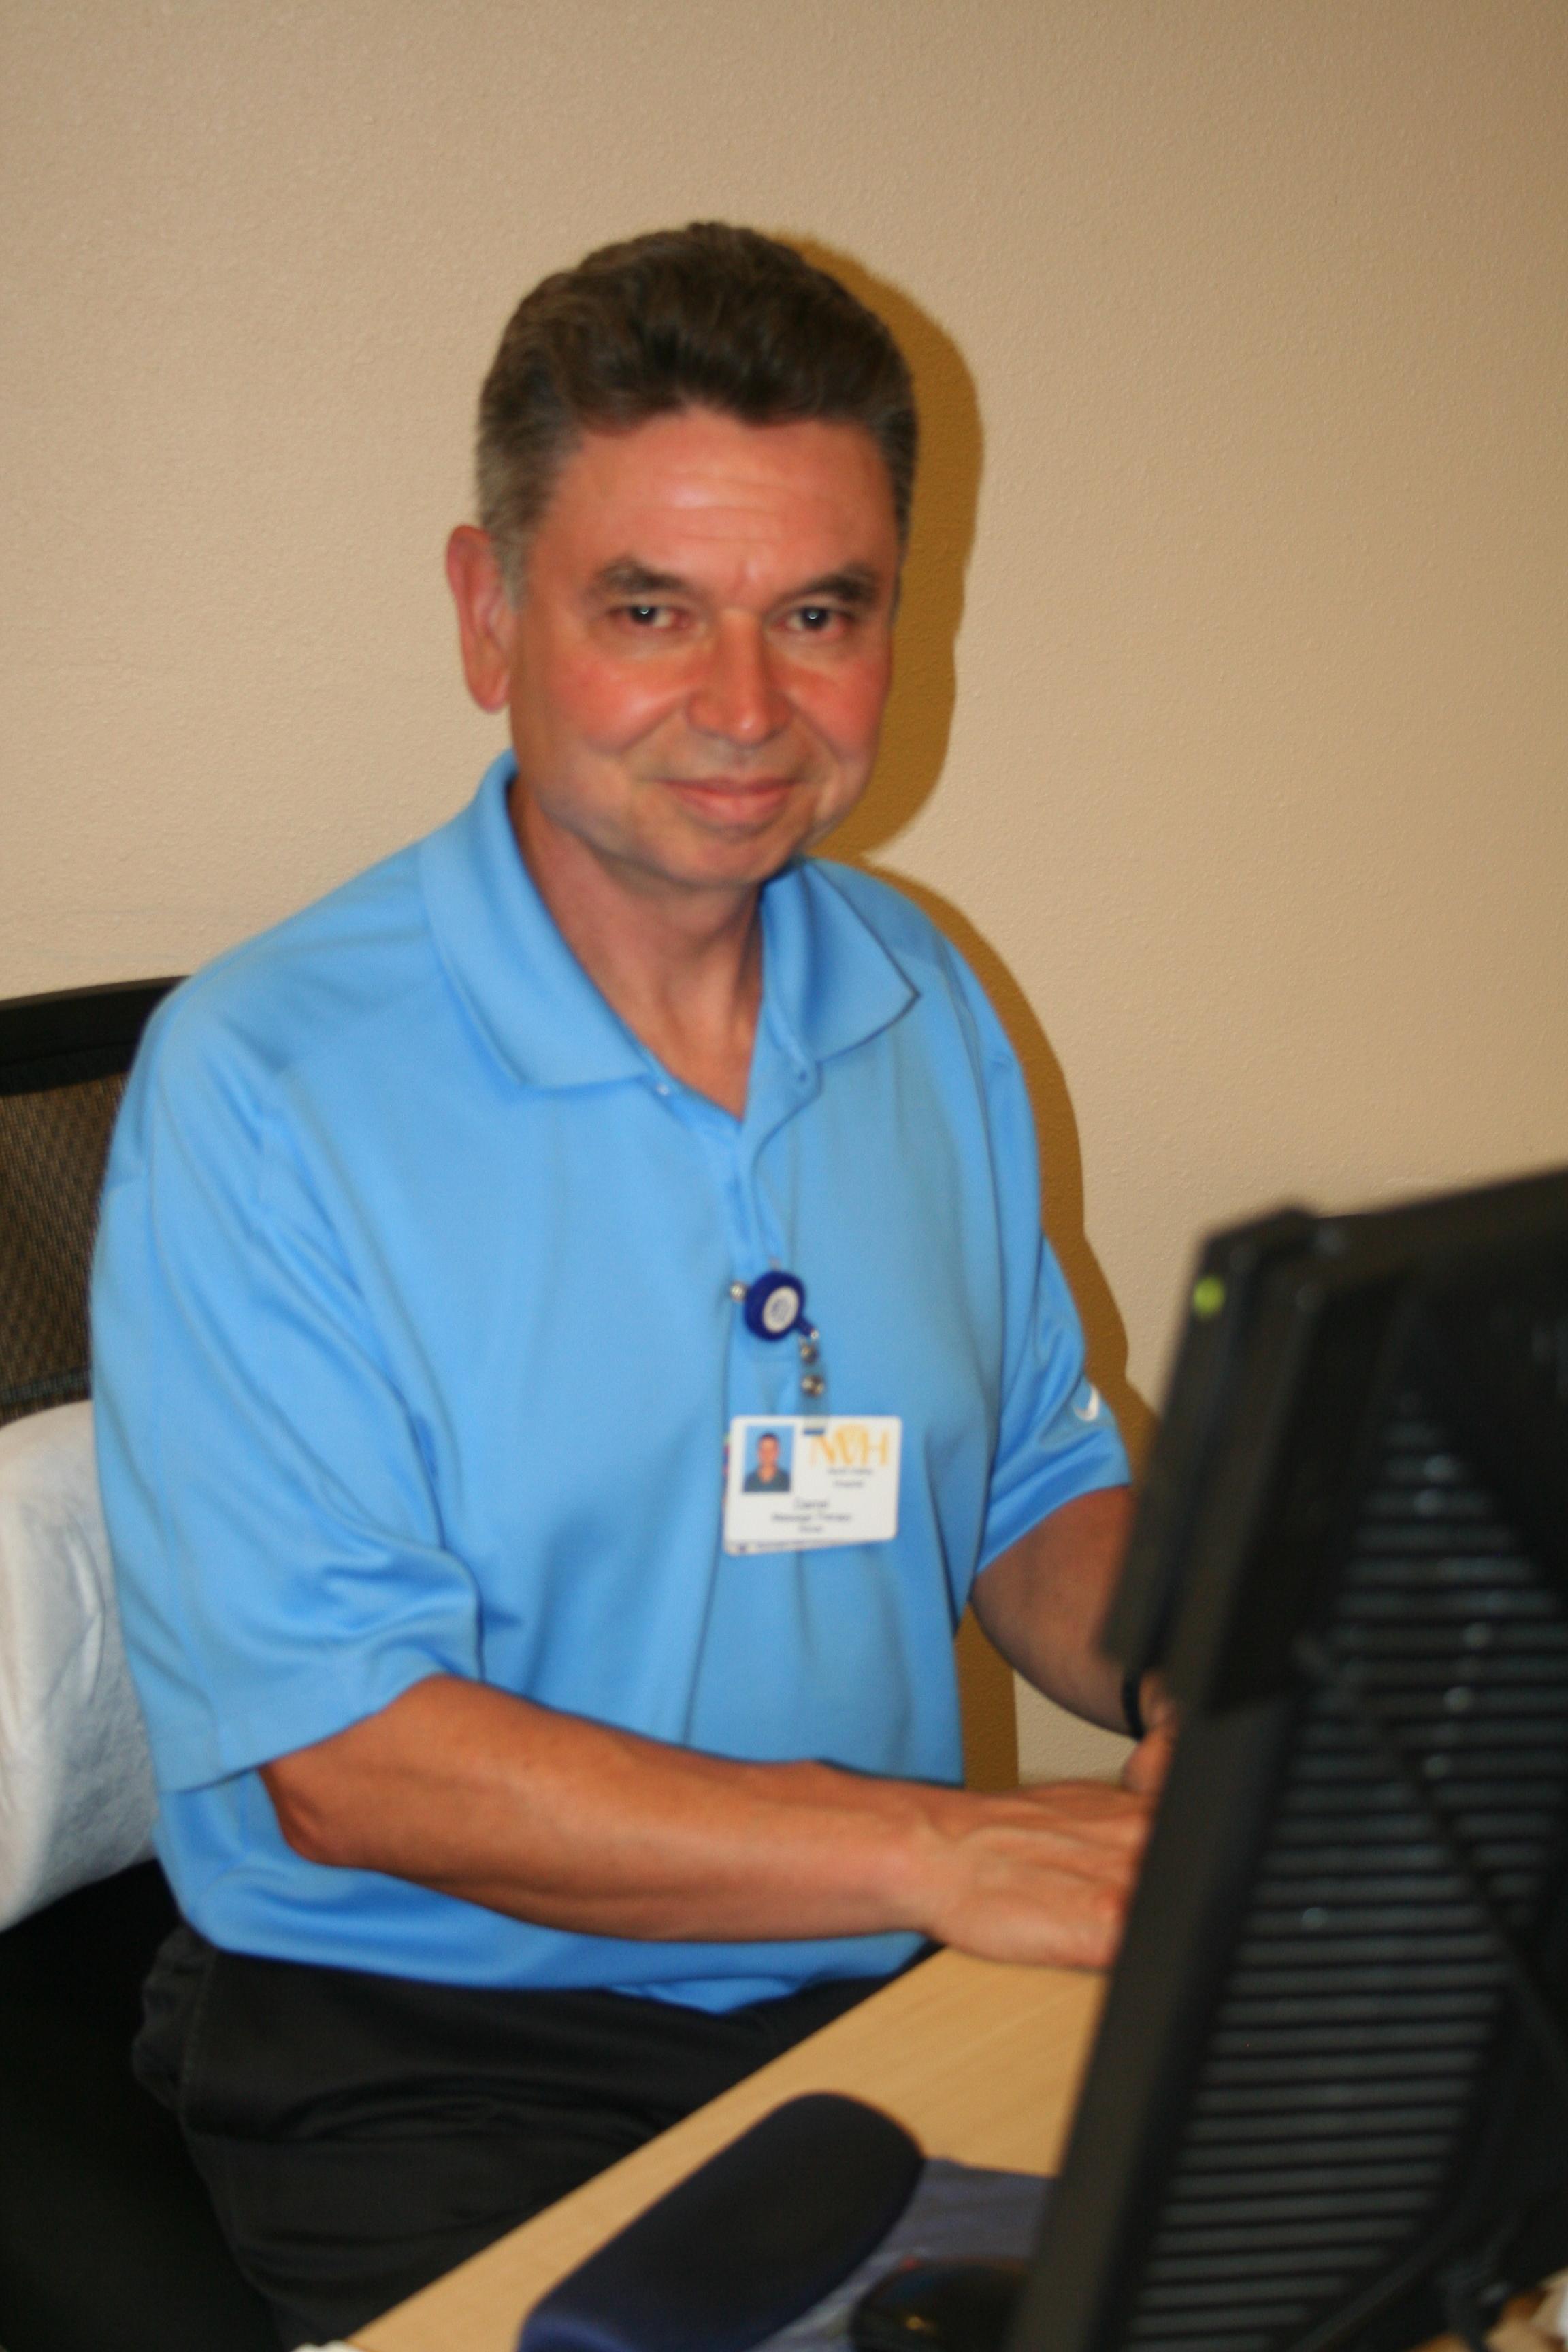 Darrel, Massage Therapist